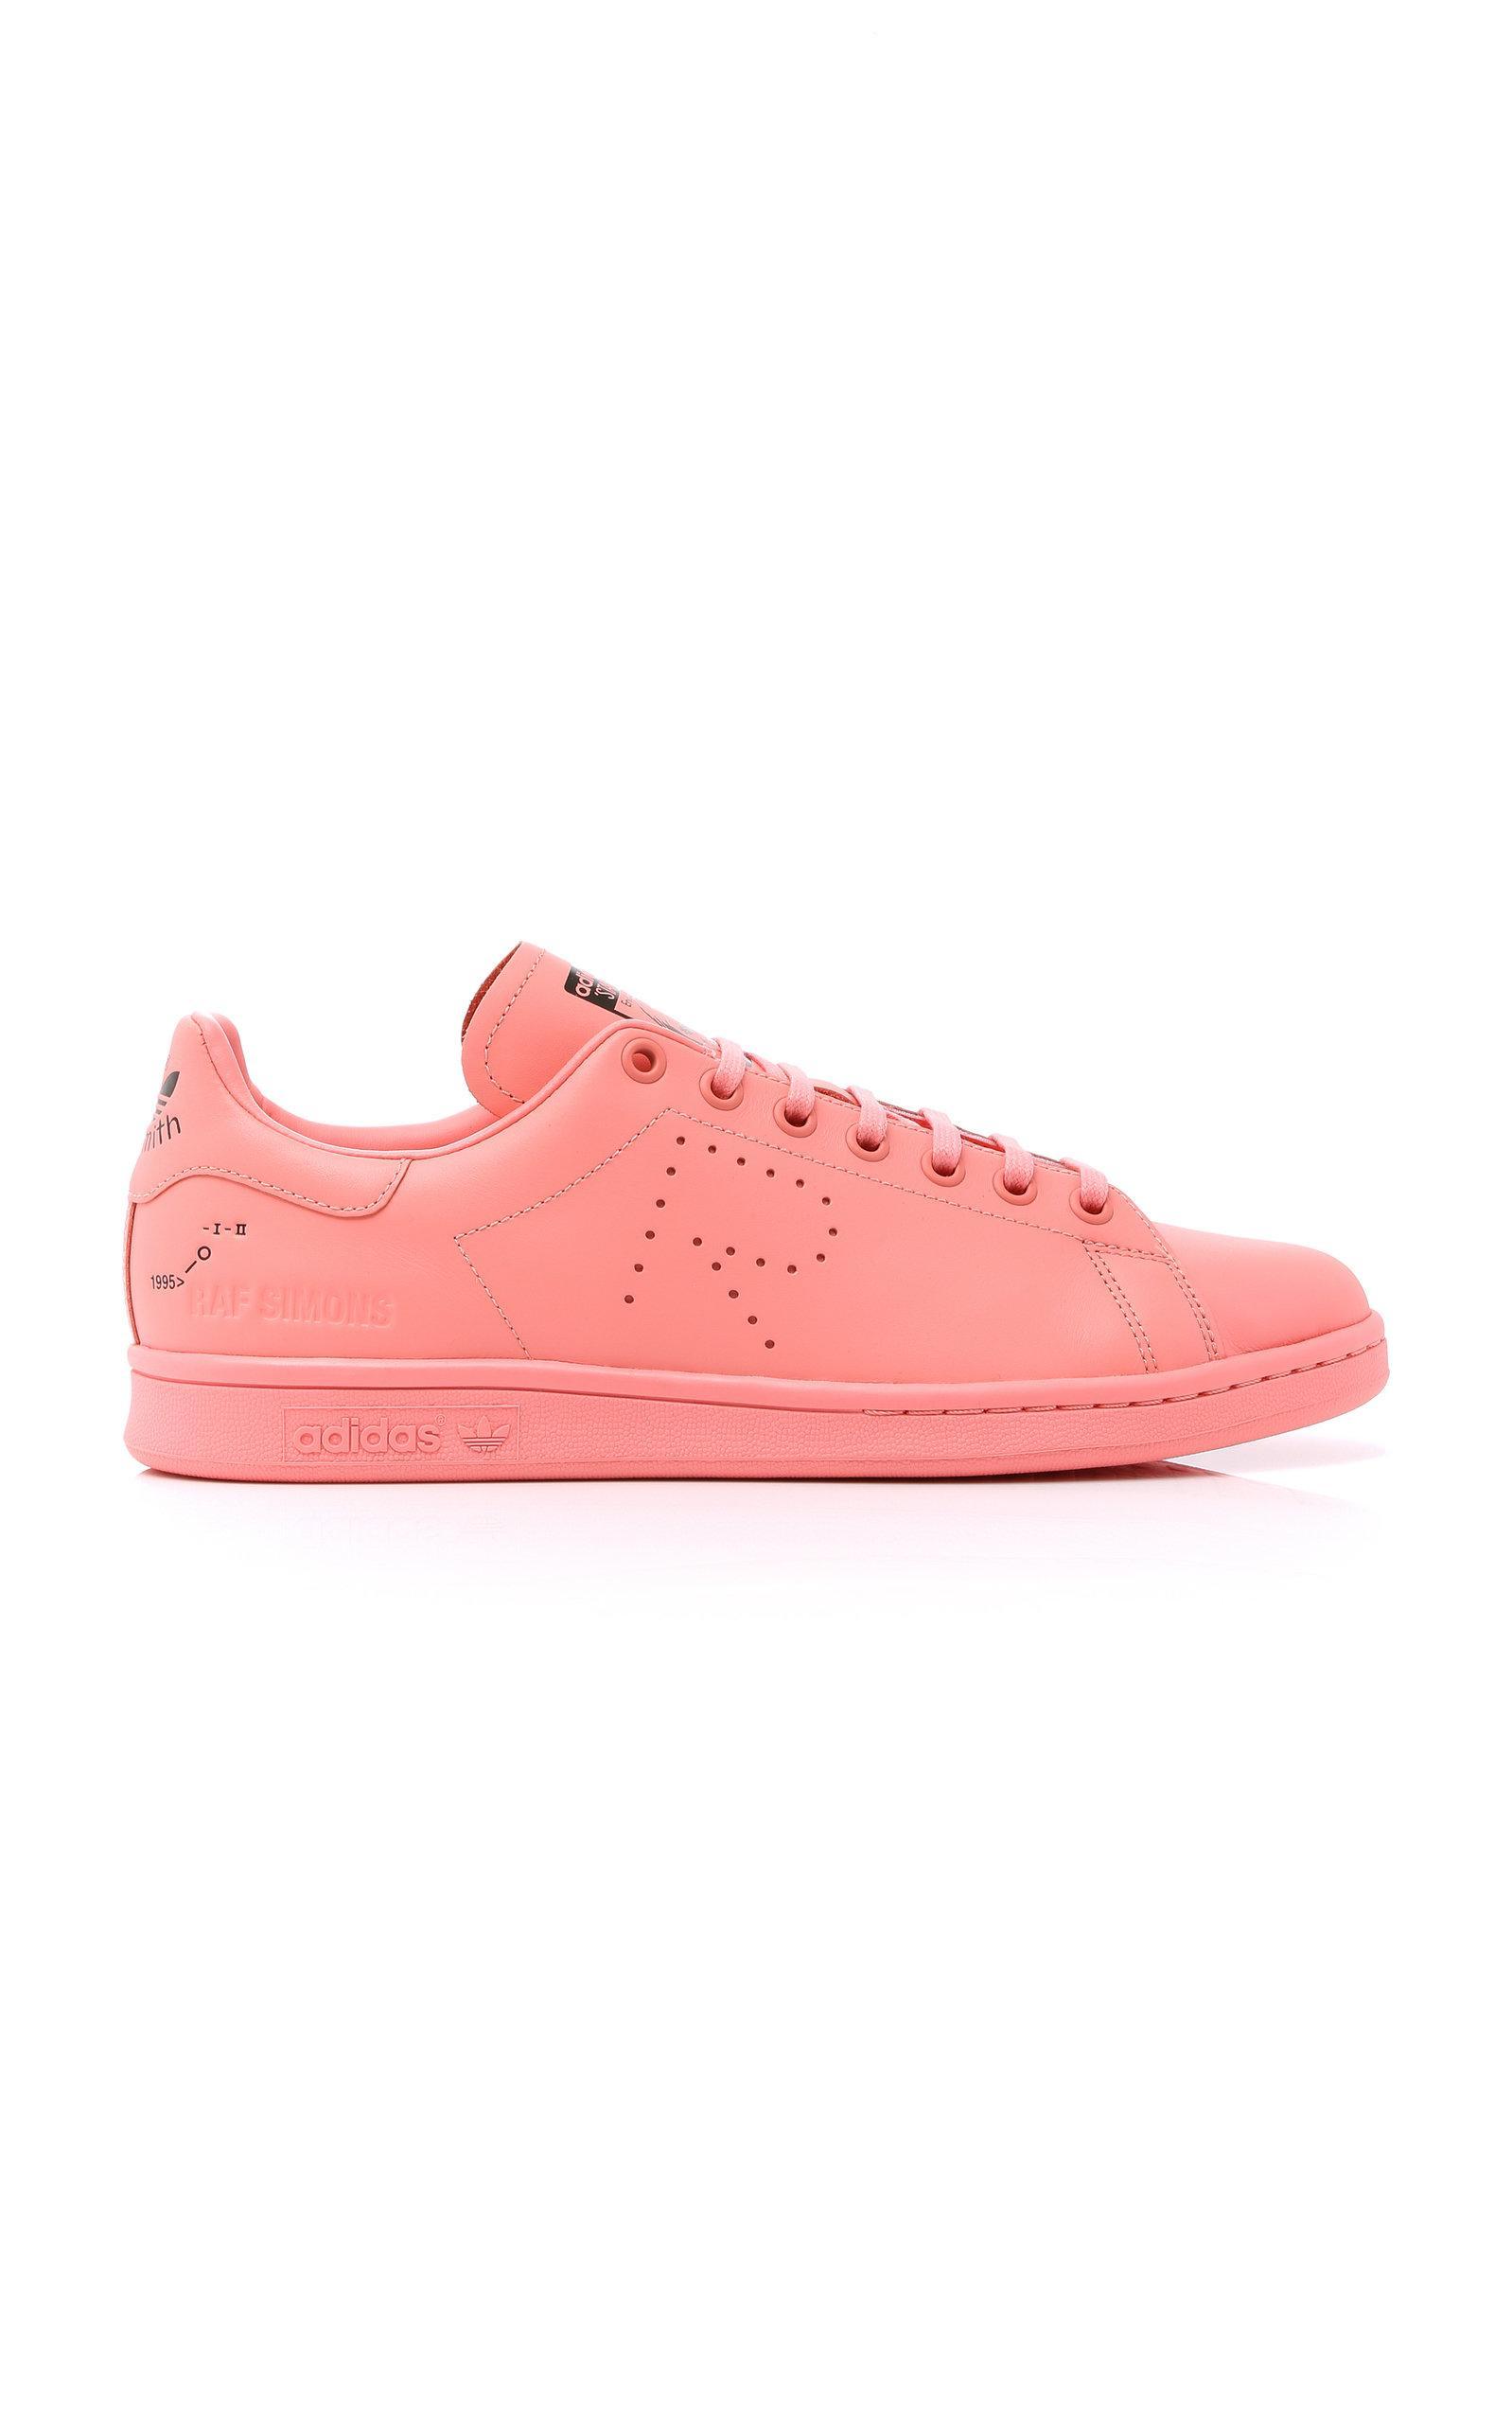 Adidas La Trainer Em buc it